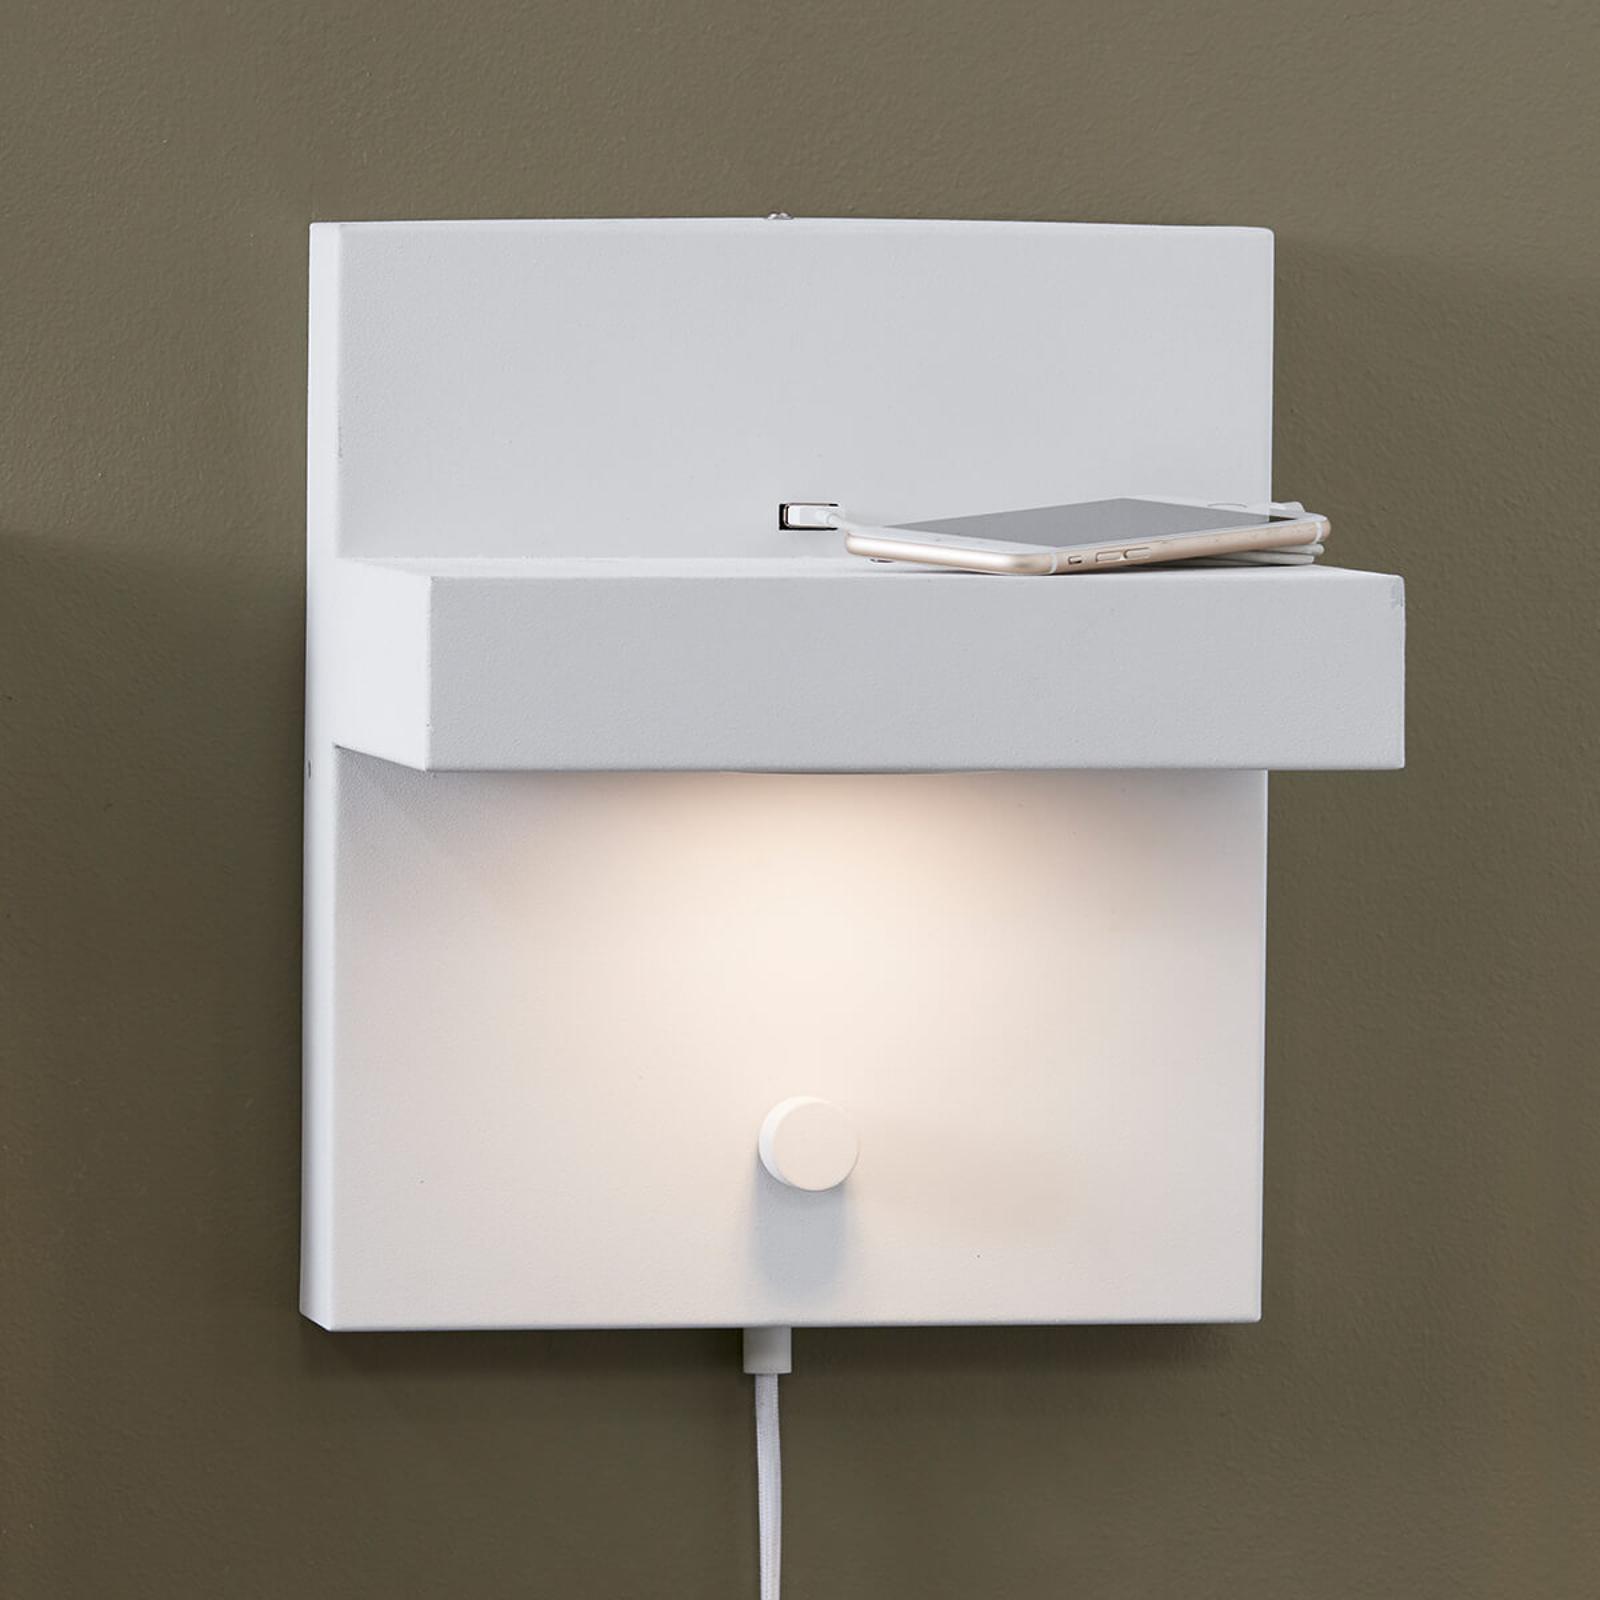 Applique LED Kubik avec port USB, blanc